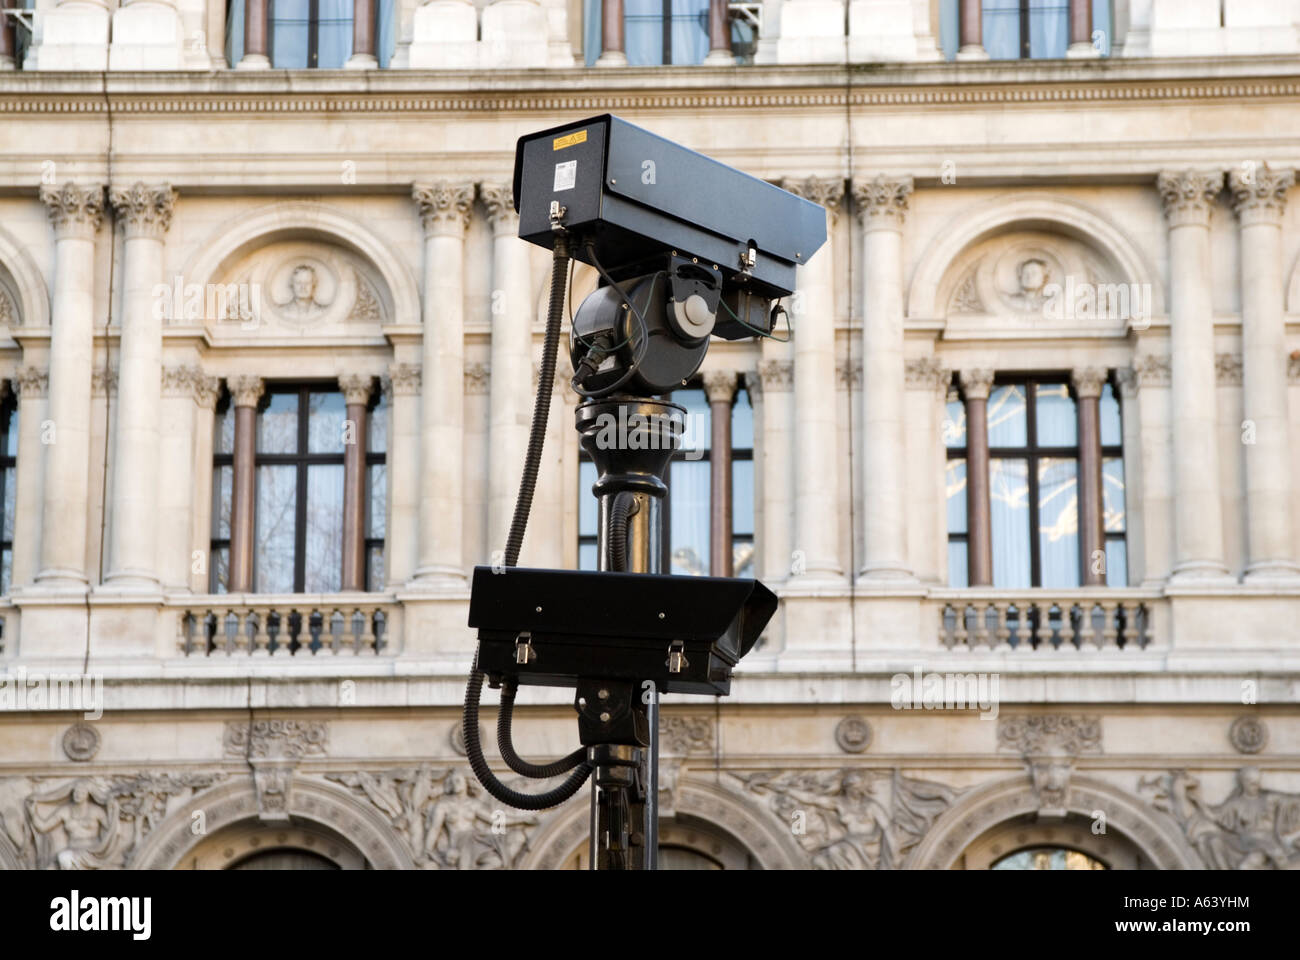 CCTV security cameras London England UK Stock Photo